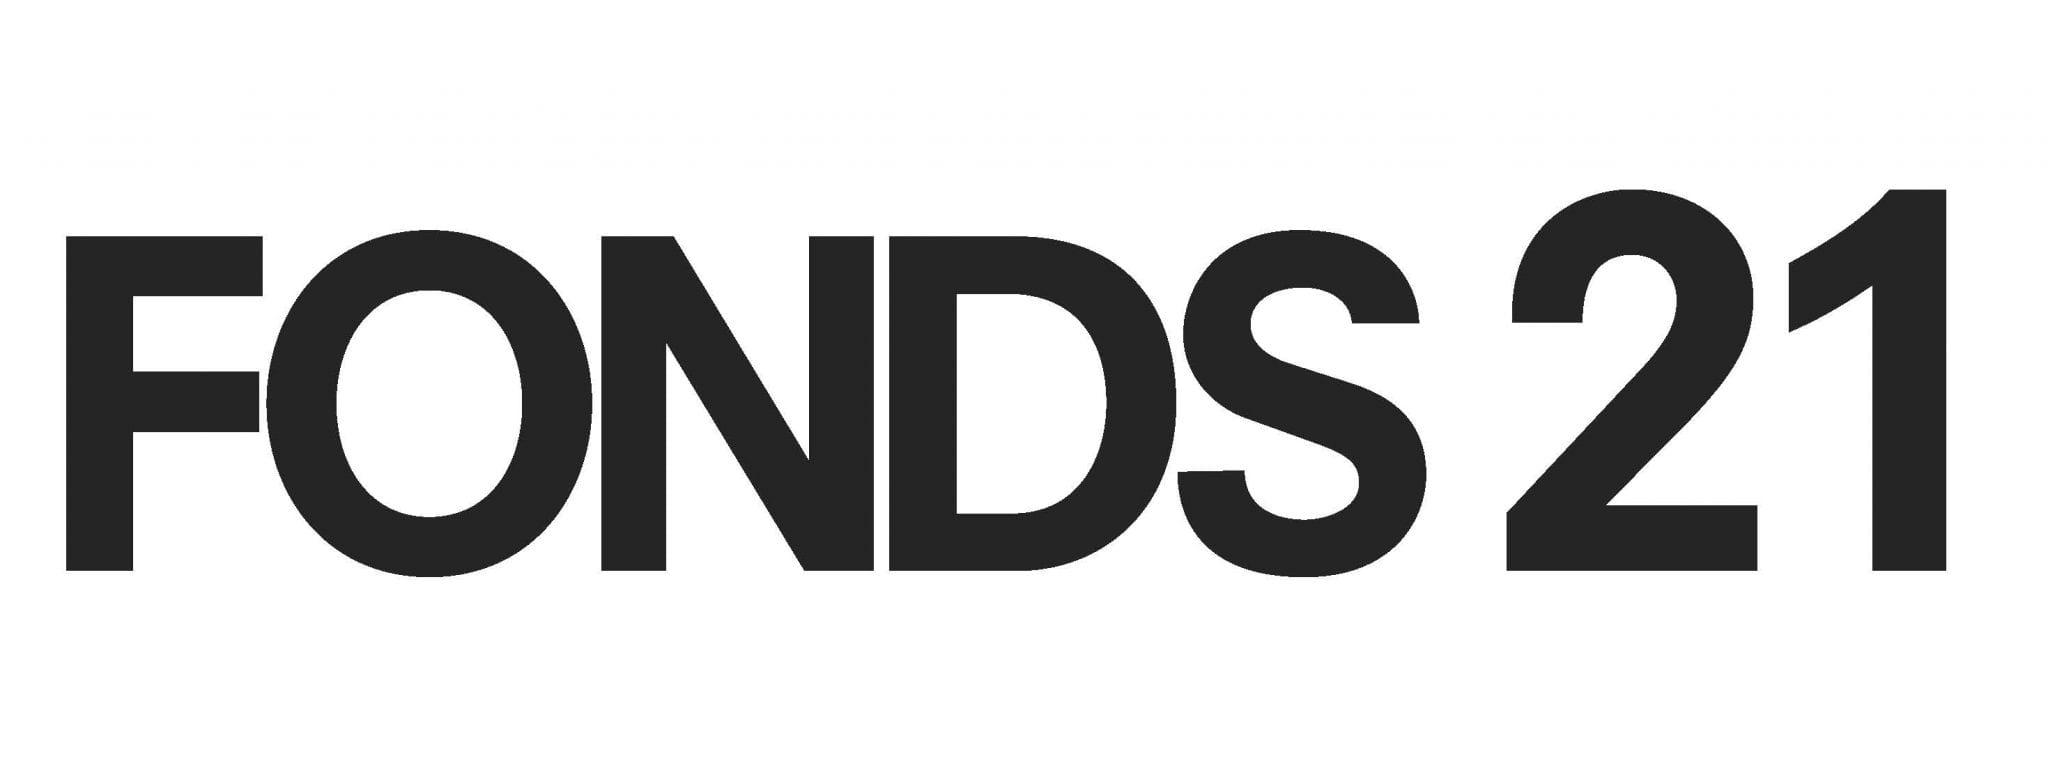 https://ilfu-14c96.kxcdn.com/wp-content/uploads/2020/01/Fonds-21.Logo_-scaled.jpg